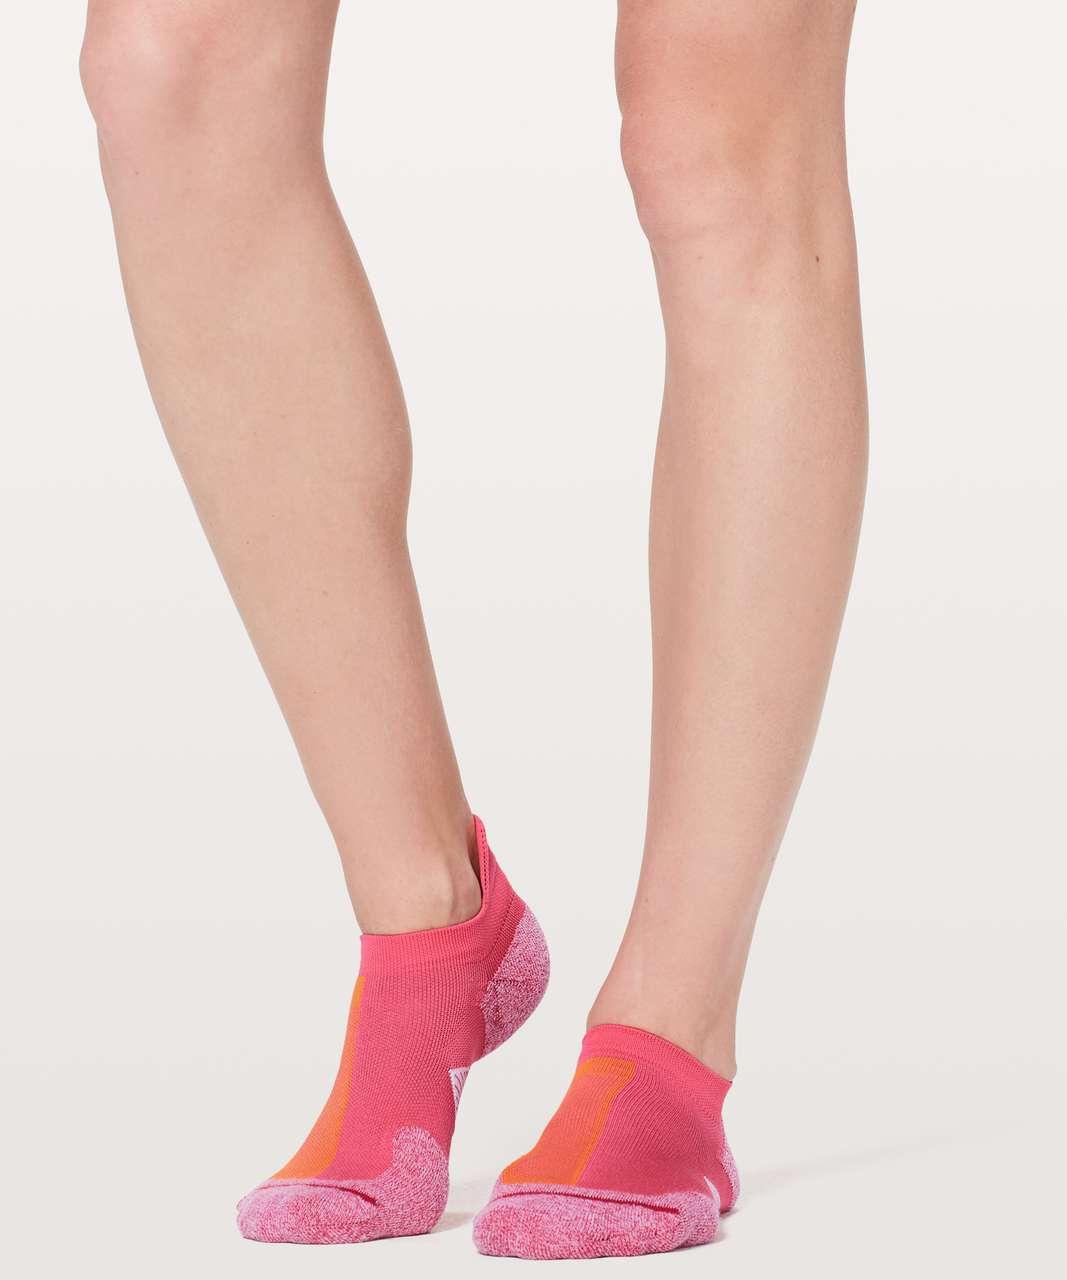 Lululemon Speed Sock *Silver - Glossy / Vivid Amber / Fuchsia Pink